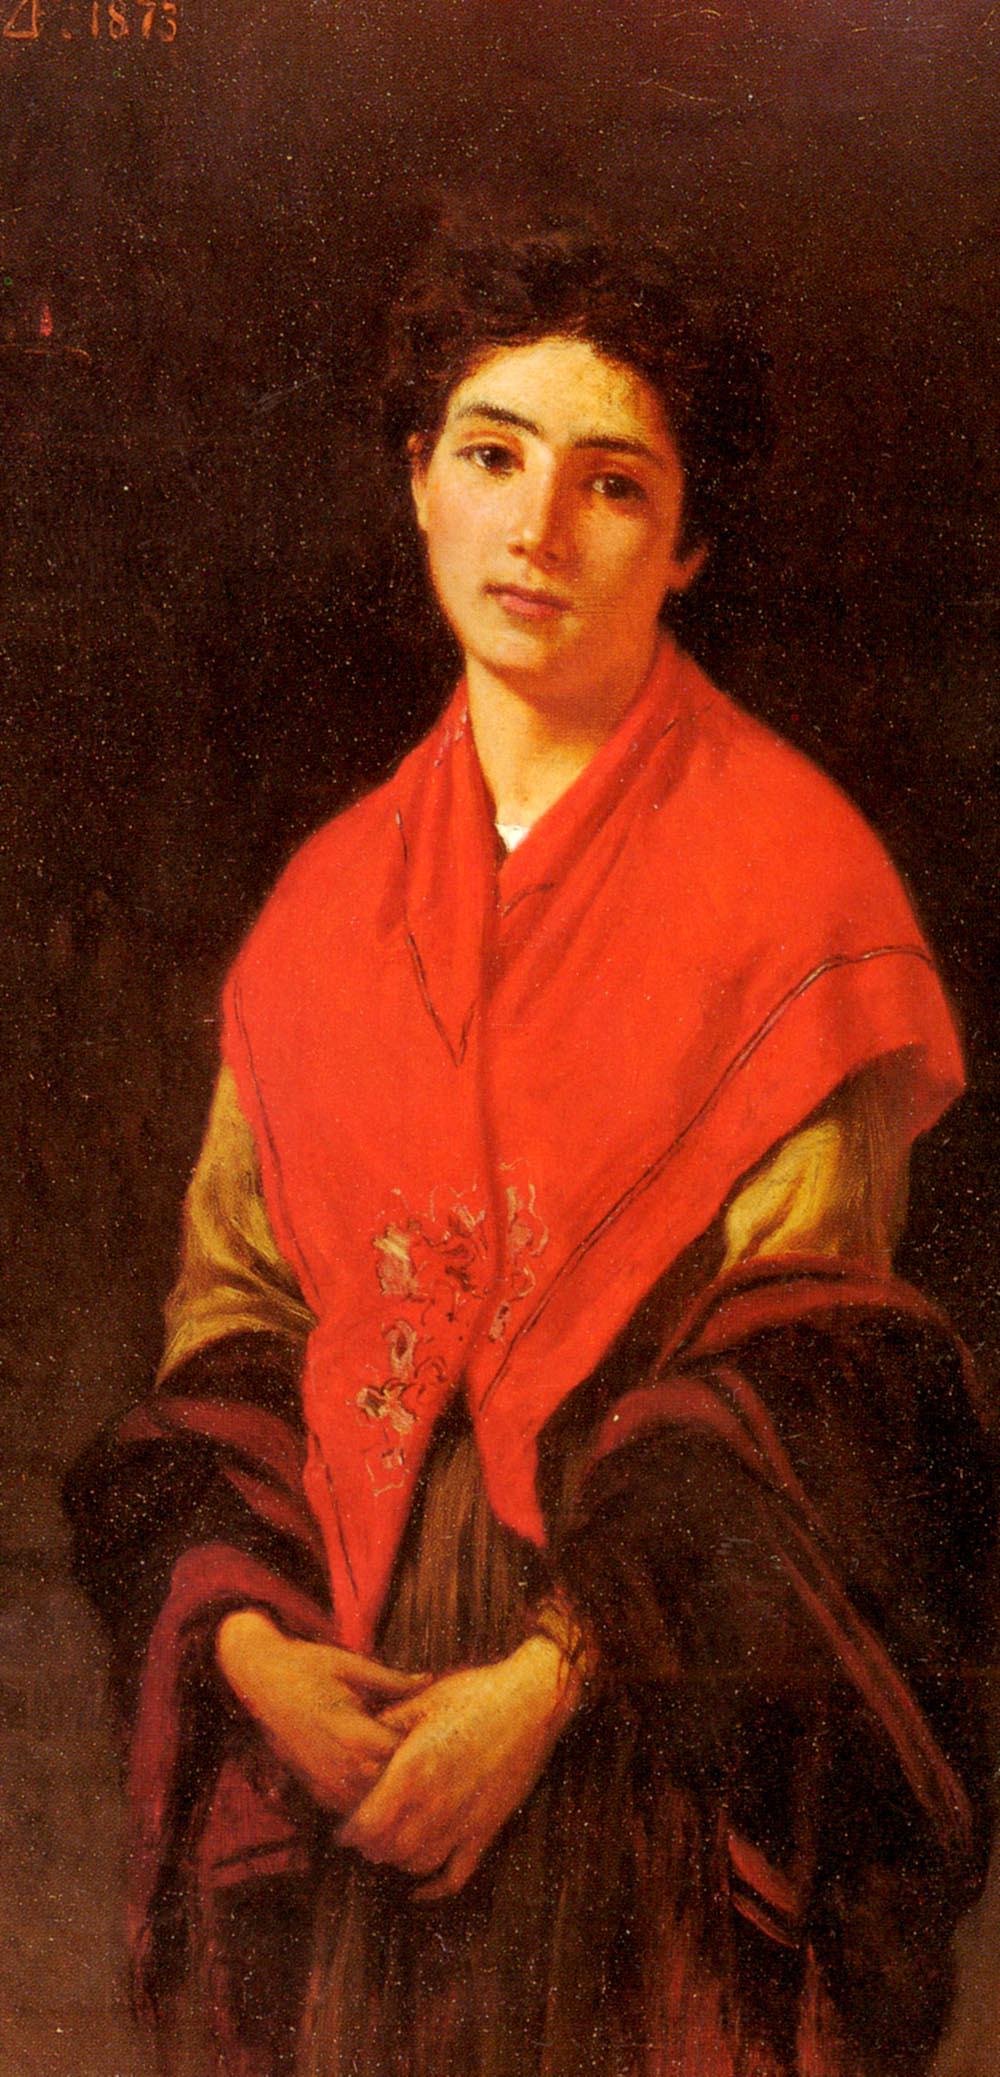 Donna In Rossa by Federigo Zandomeneghi